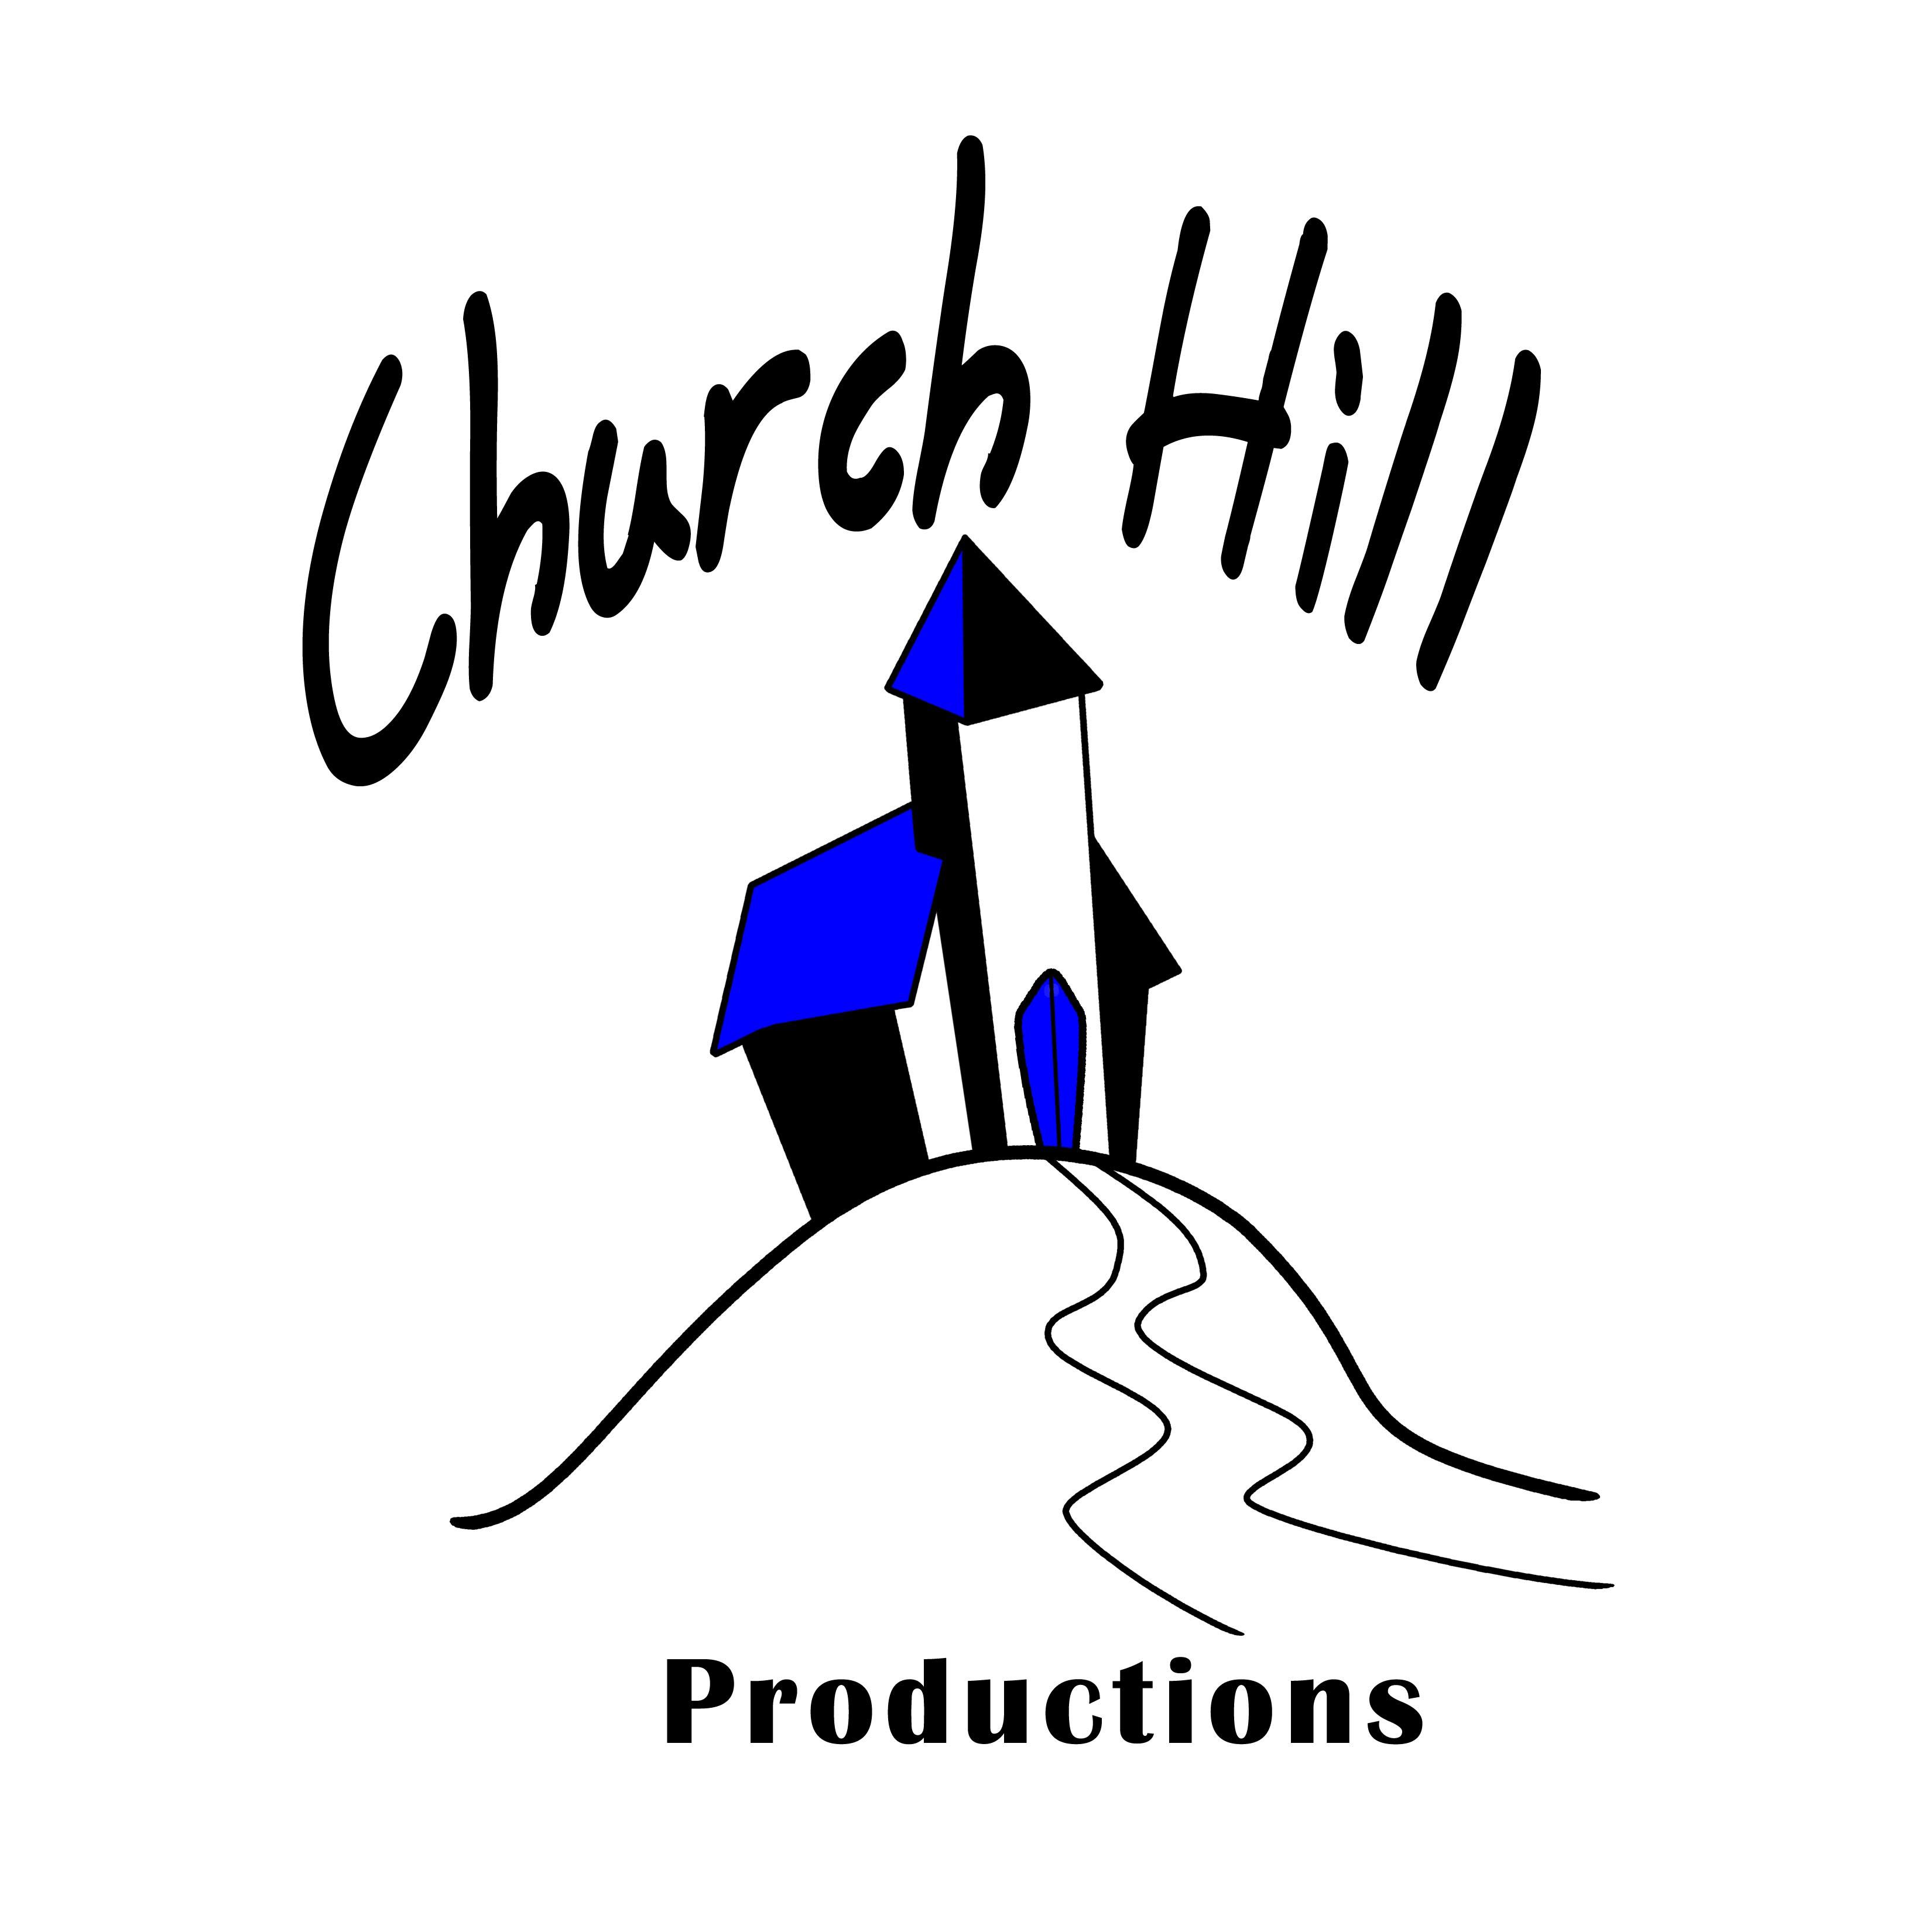 3300x3300 Churchhill